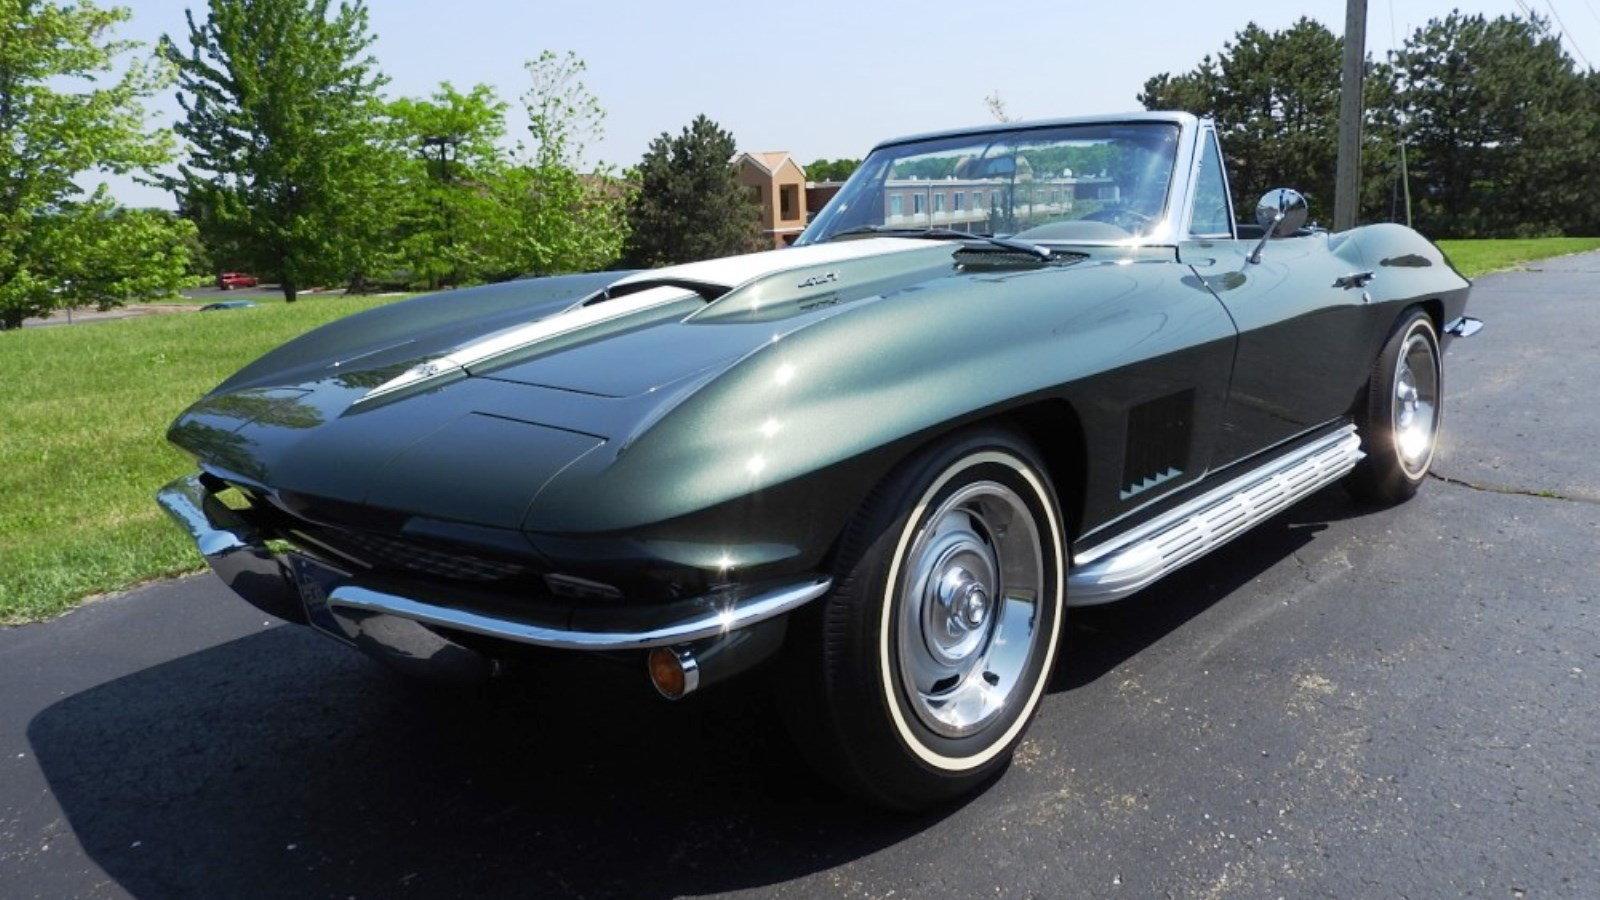 1967 Corvette Goodwood Green